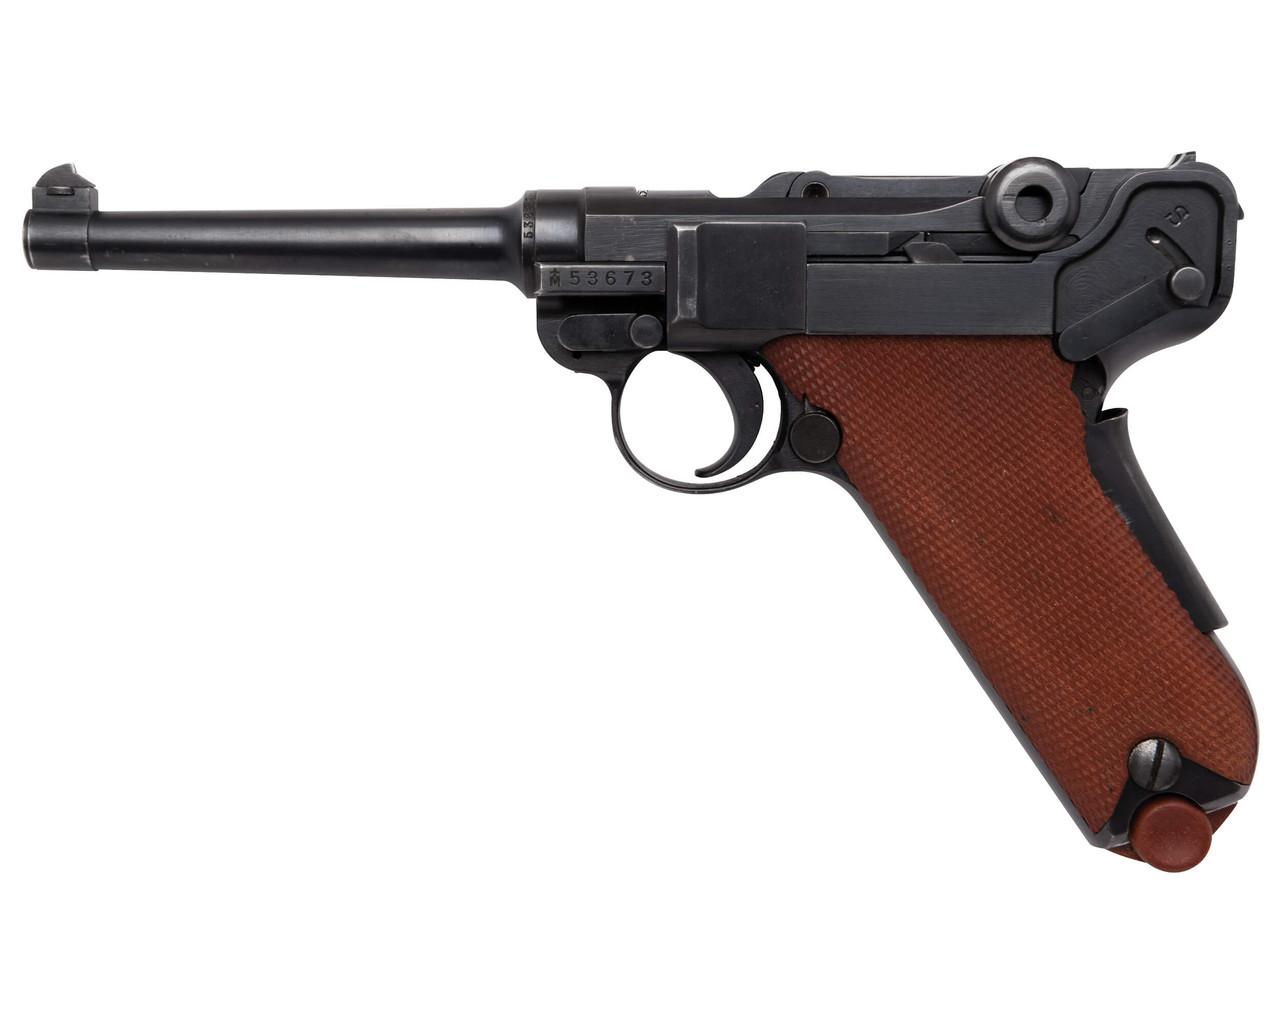 W+F Bern Swiss 06/29 Luger, Red Grips w/ Holster - sn 53xxx